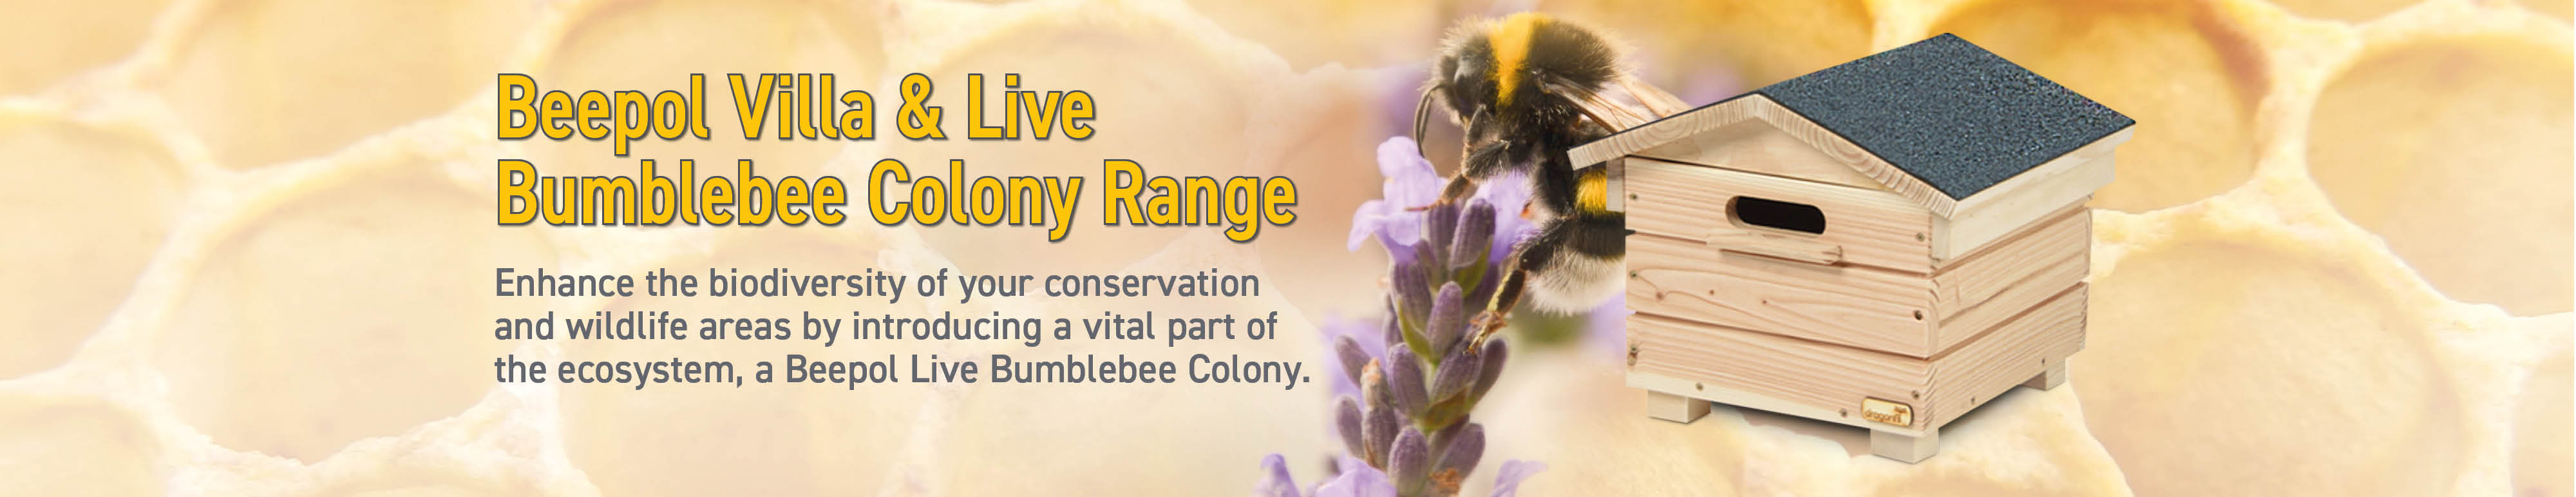 Beepol Villa & Live Bumblebee  Colony Range Slider